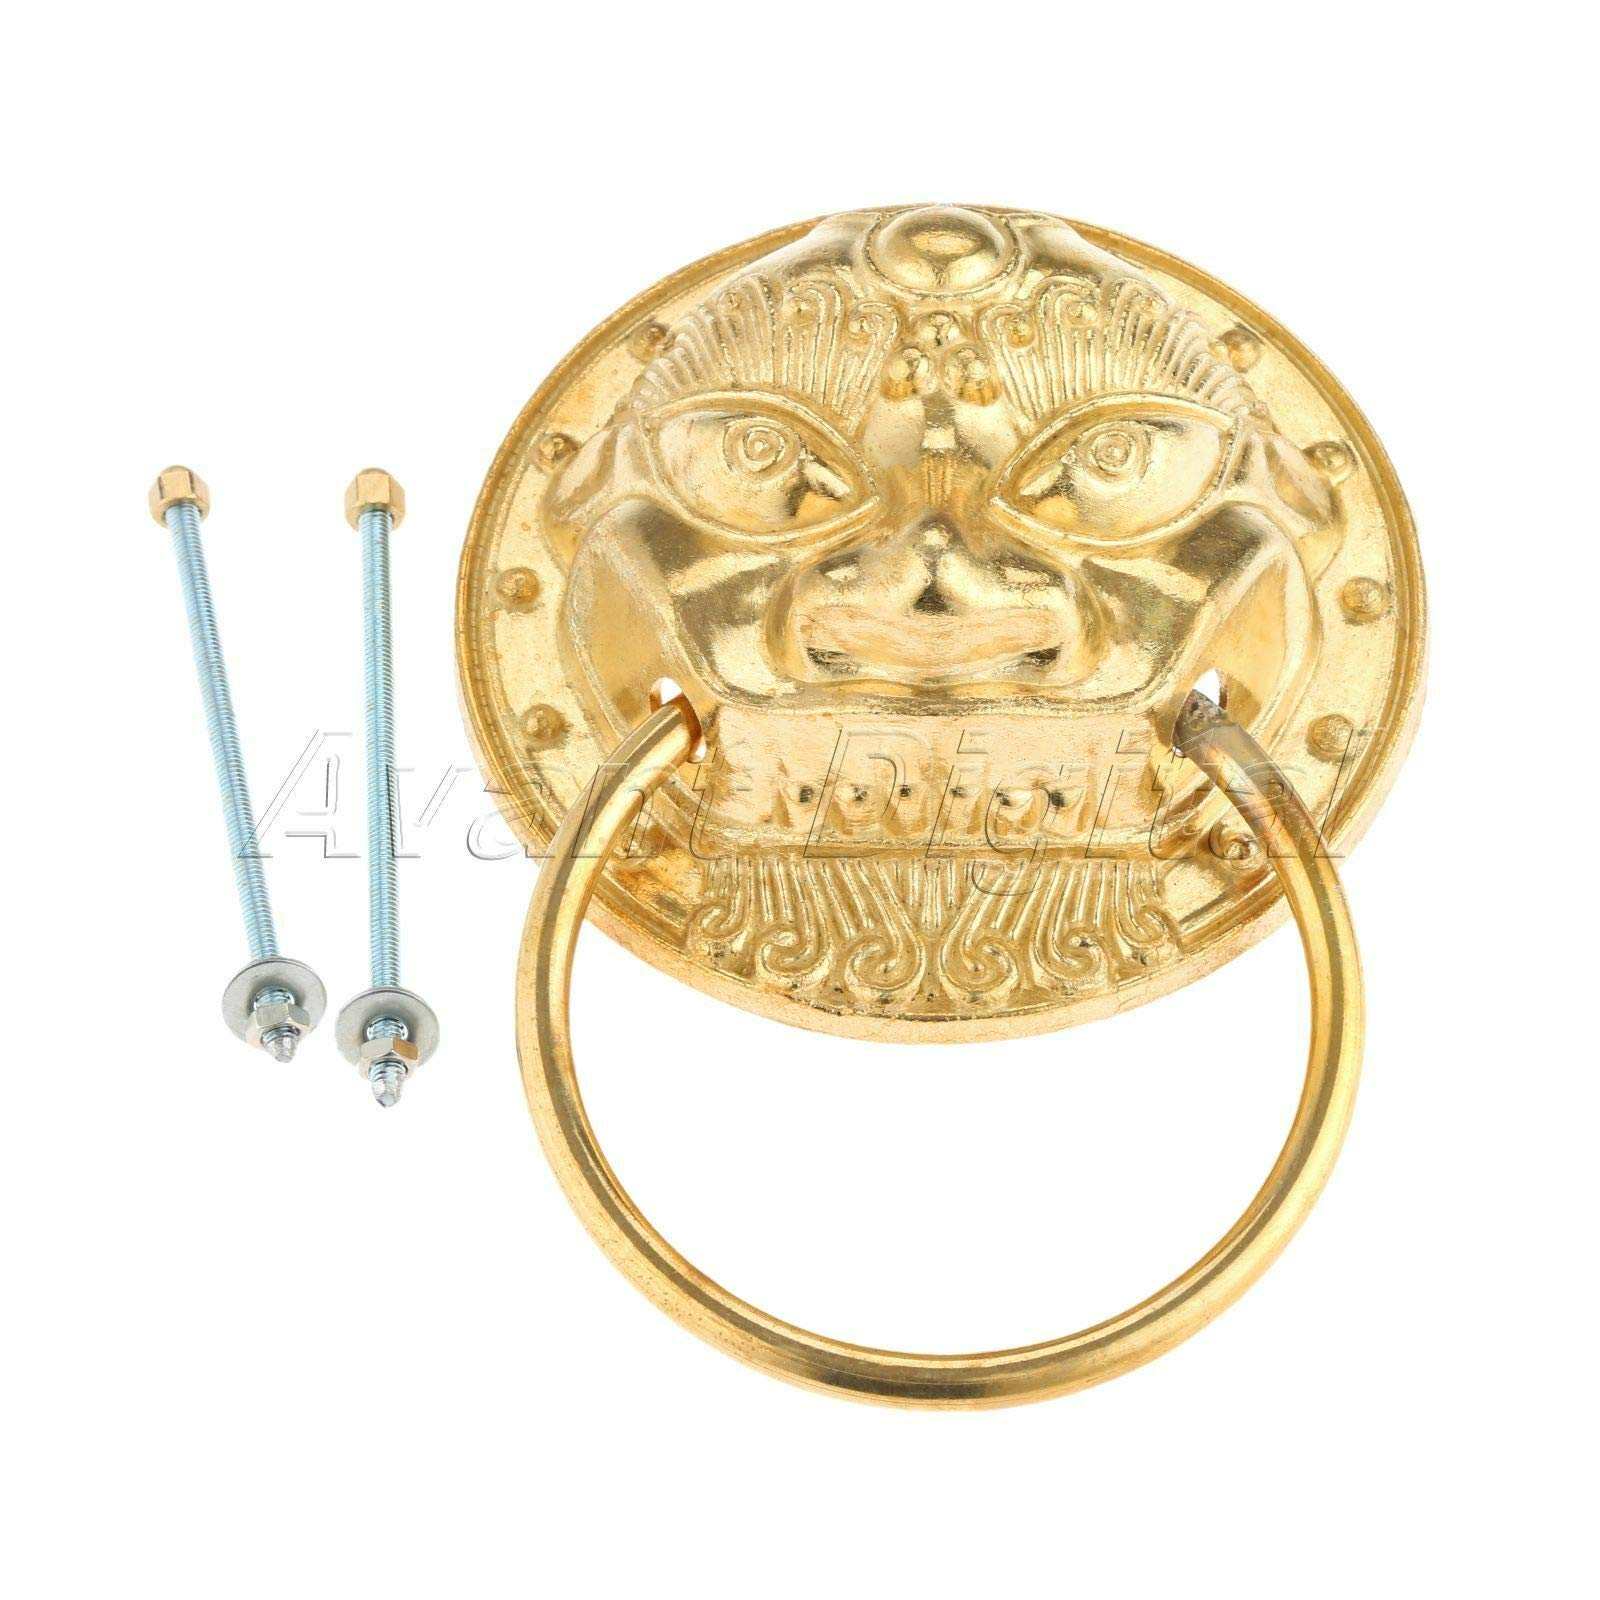 Mercury_Group, Antique Retro Vintage Pulls Knobs, Chinese Brass Hardware Handle Kitchen Lion Head Drop Ring Pull Knocker Knob DIY - (Color: Brass)